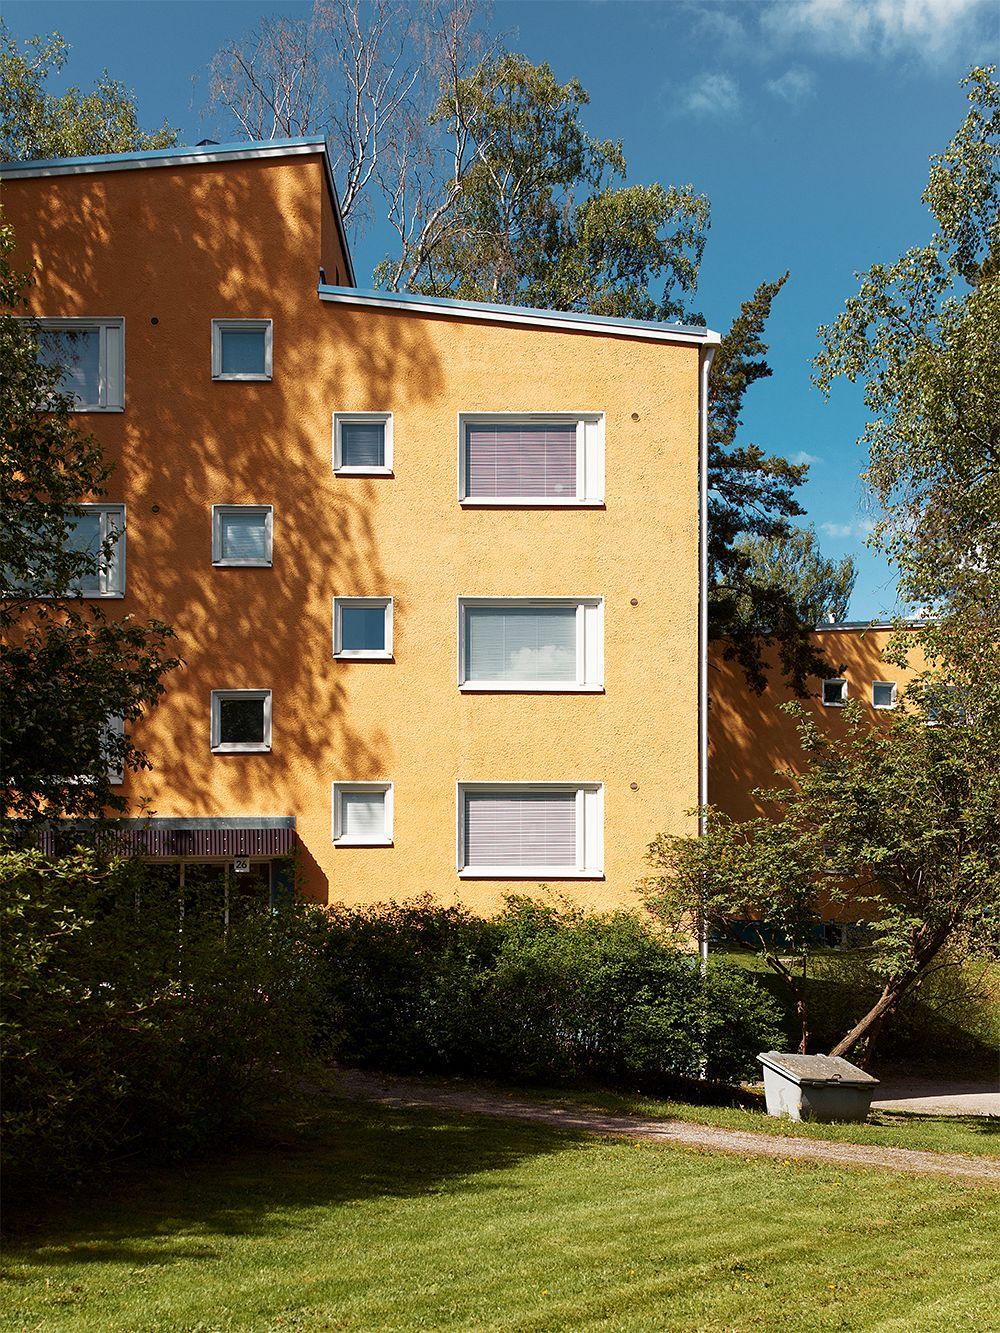 Tapiola architecture